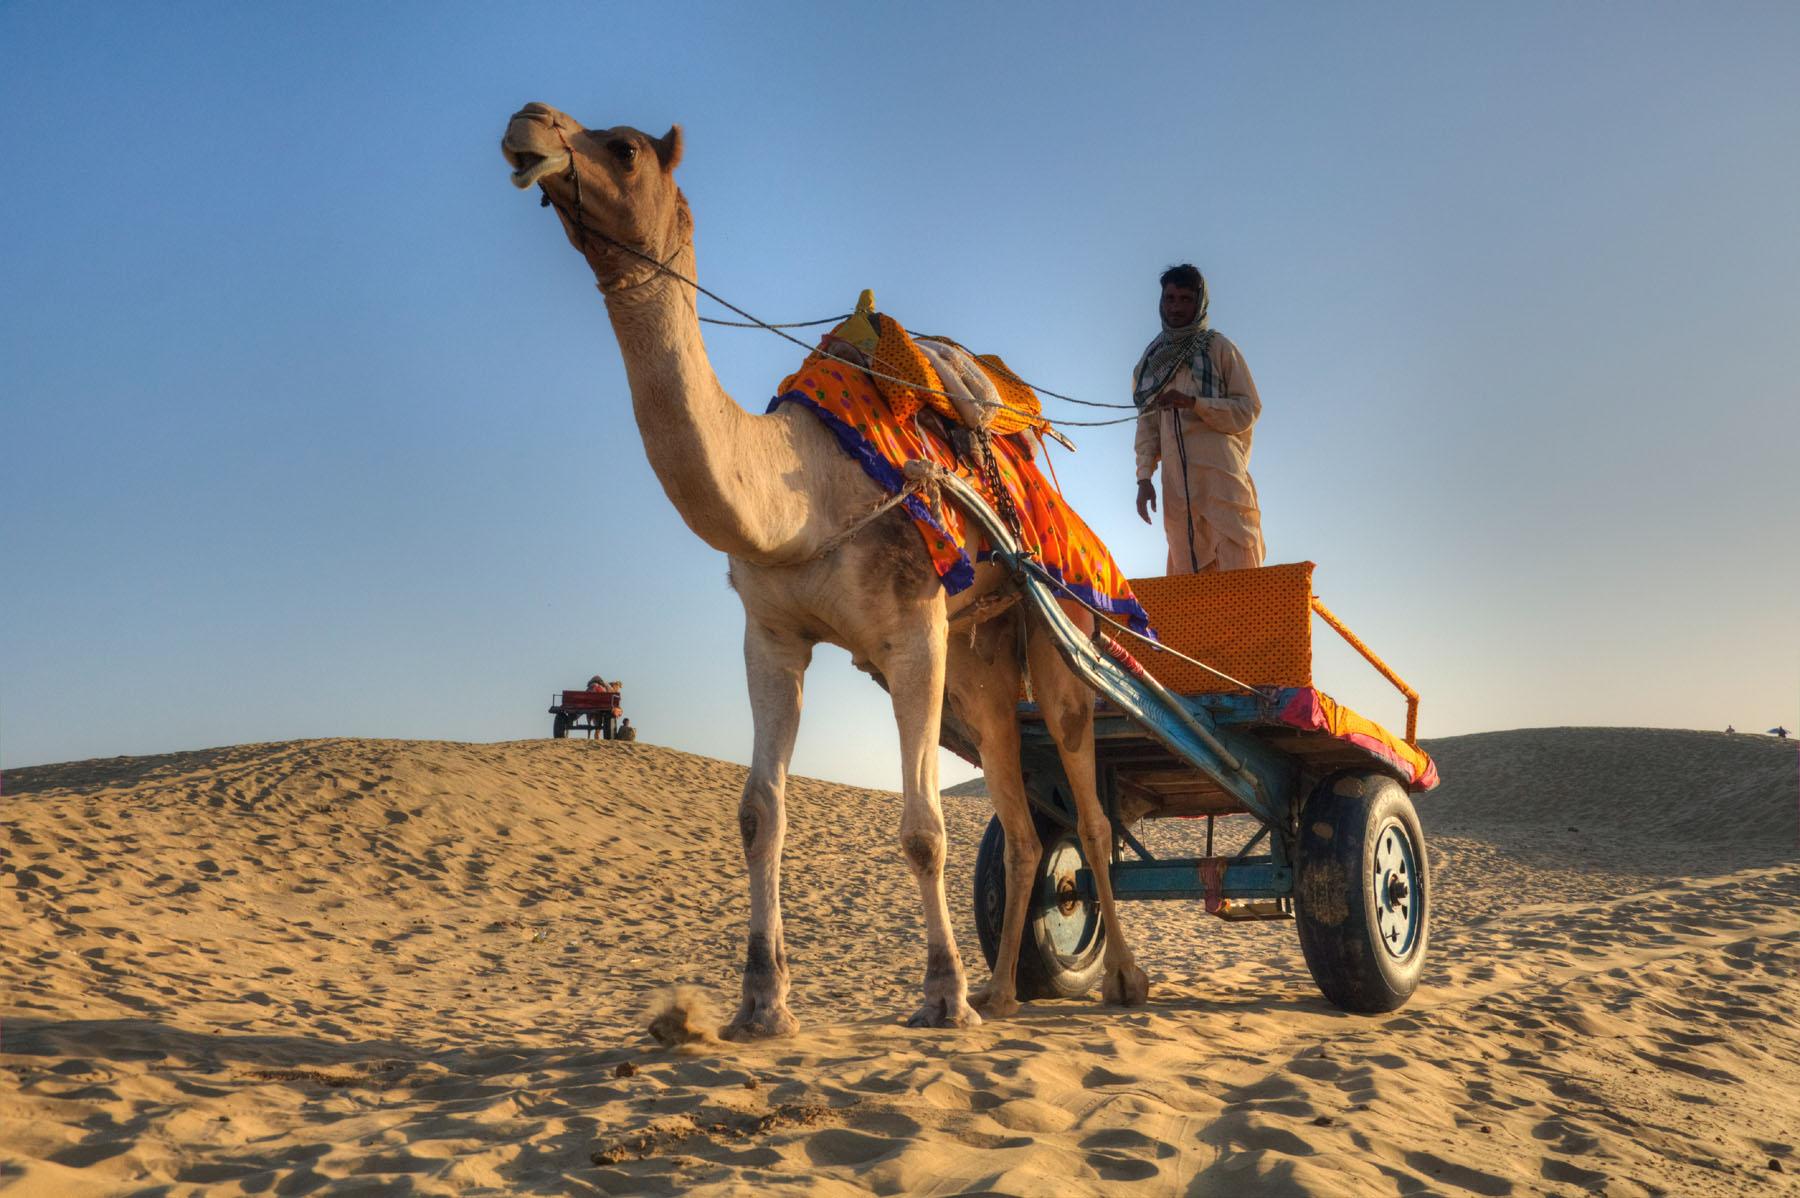 Camel riding on sand dunes in Jaisalmer